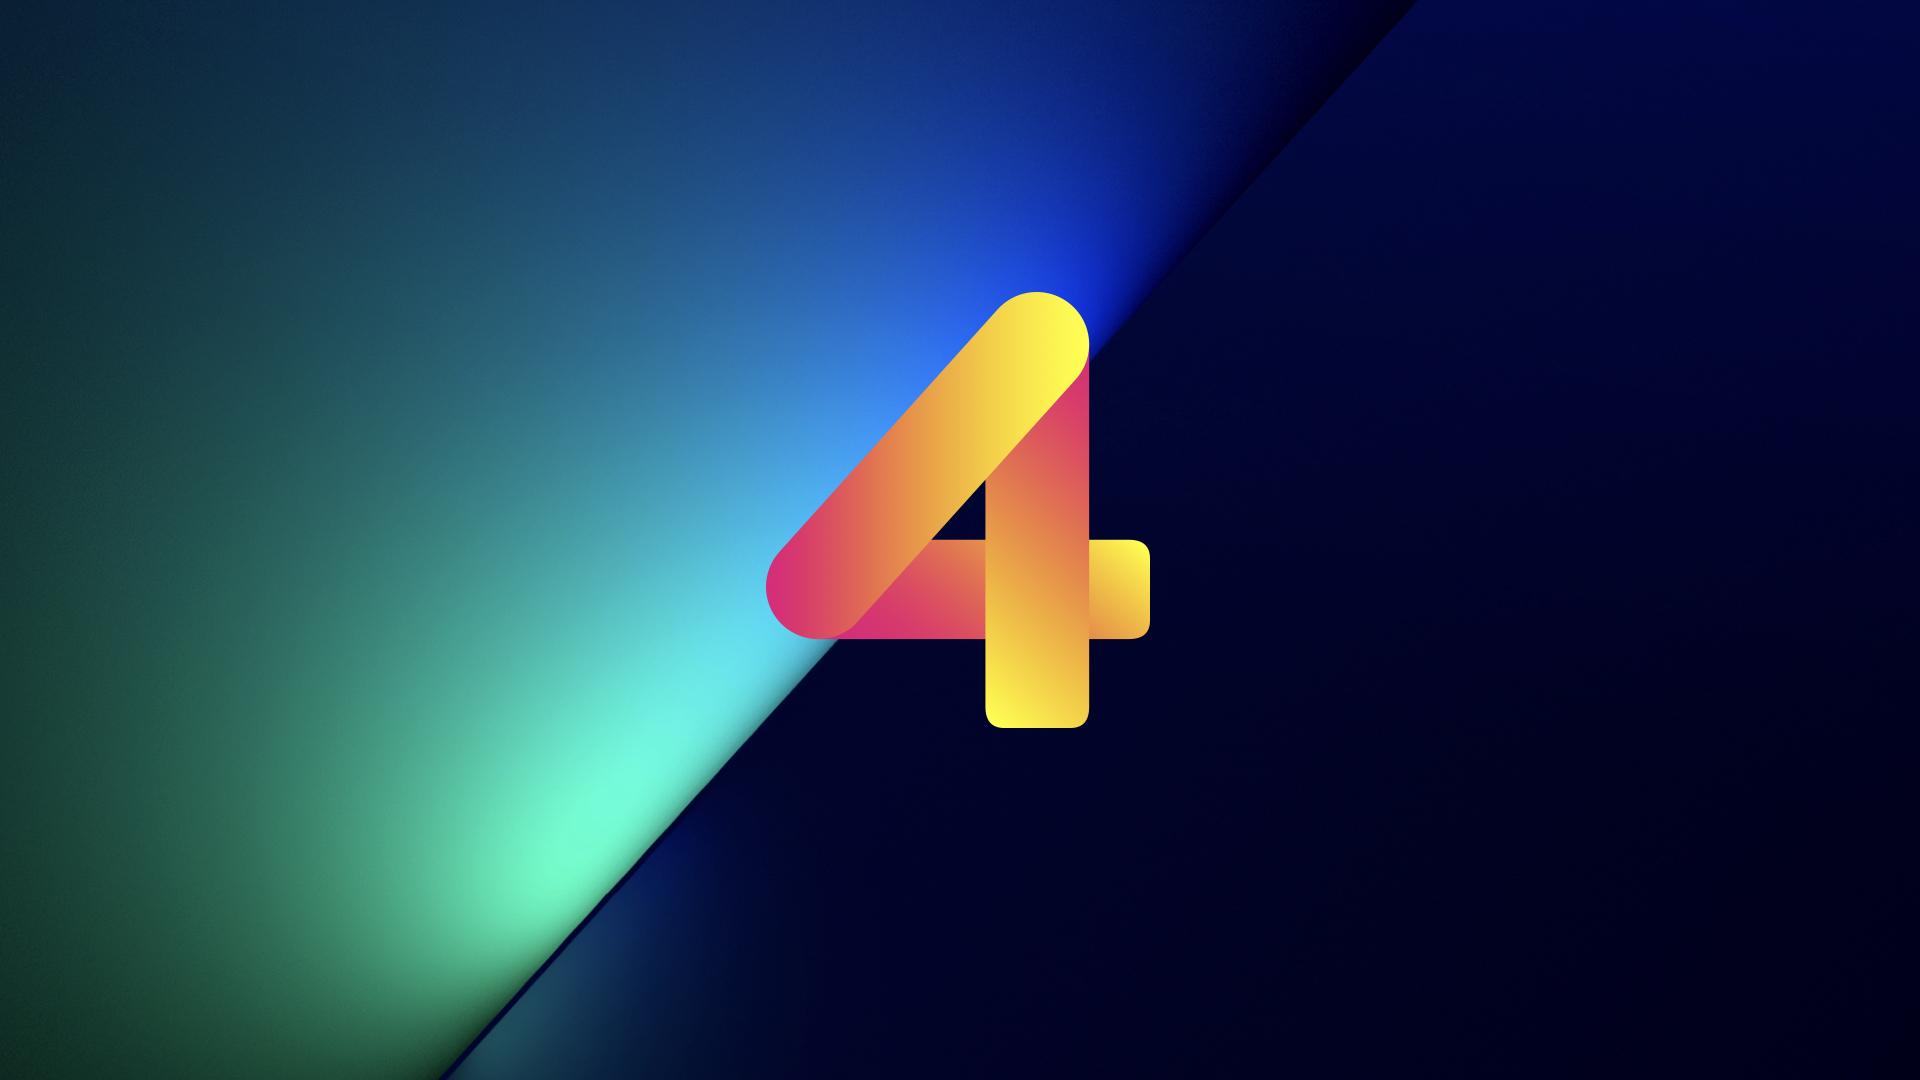 Nelonen Animated Logo animation motion graphic design